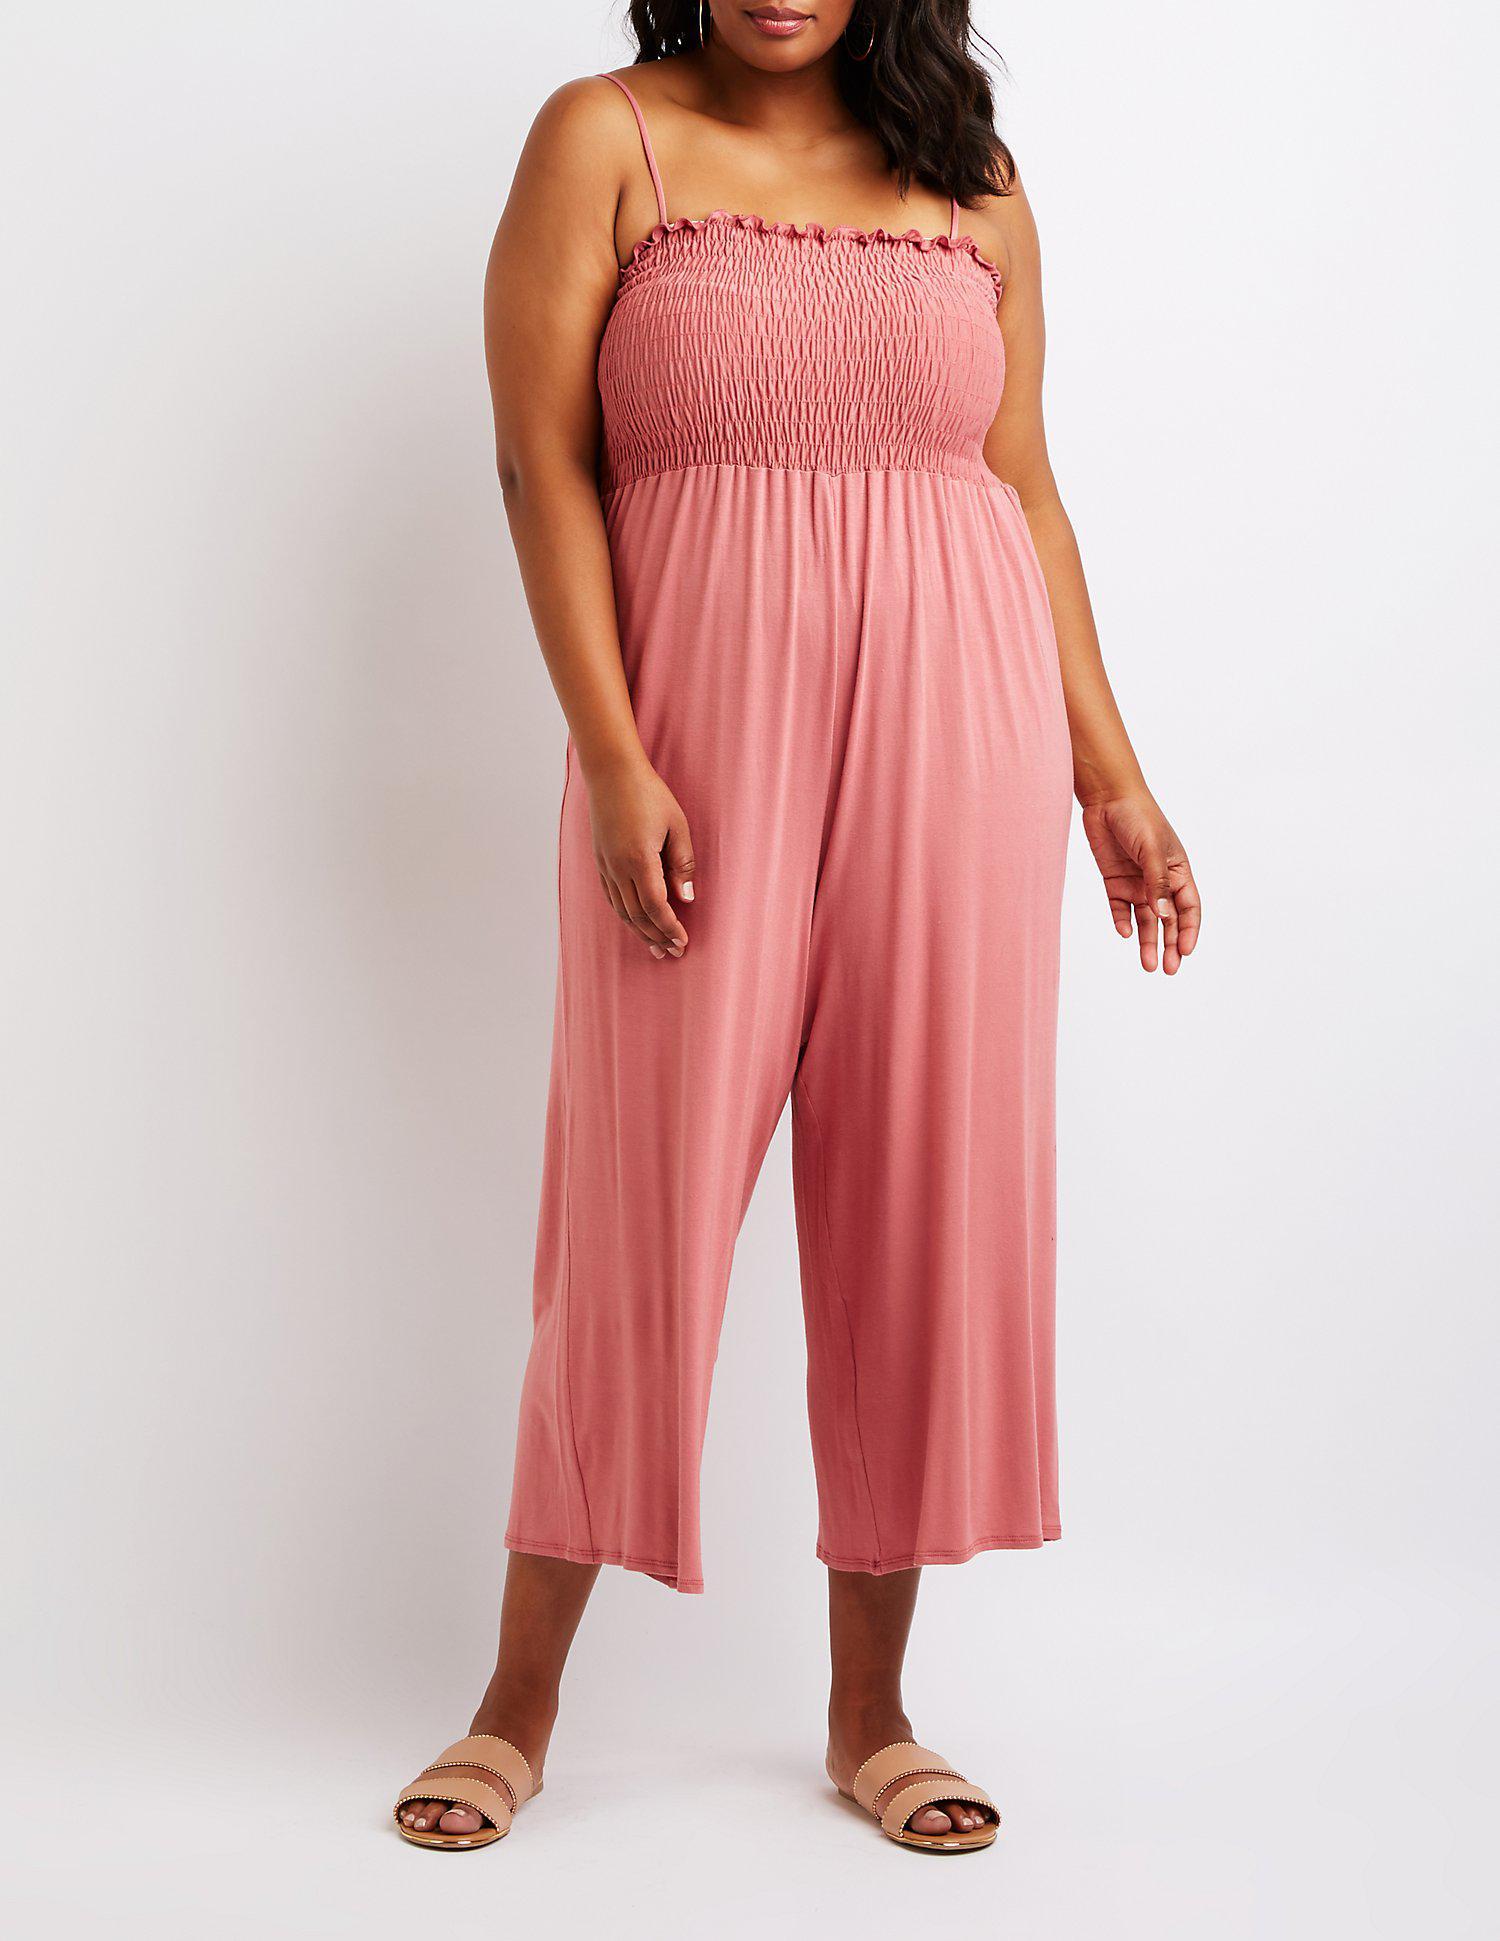 dff09e88155 Lyst - Charlotte Russe Plus Size Smocked Culotte Jumpsuit in Purple